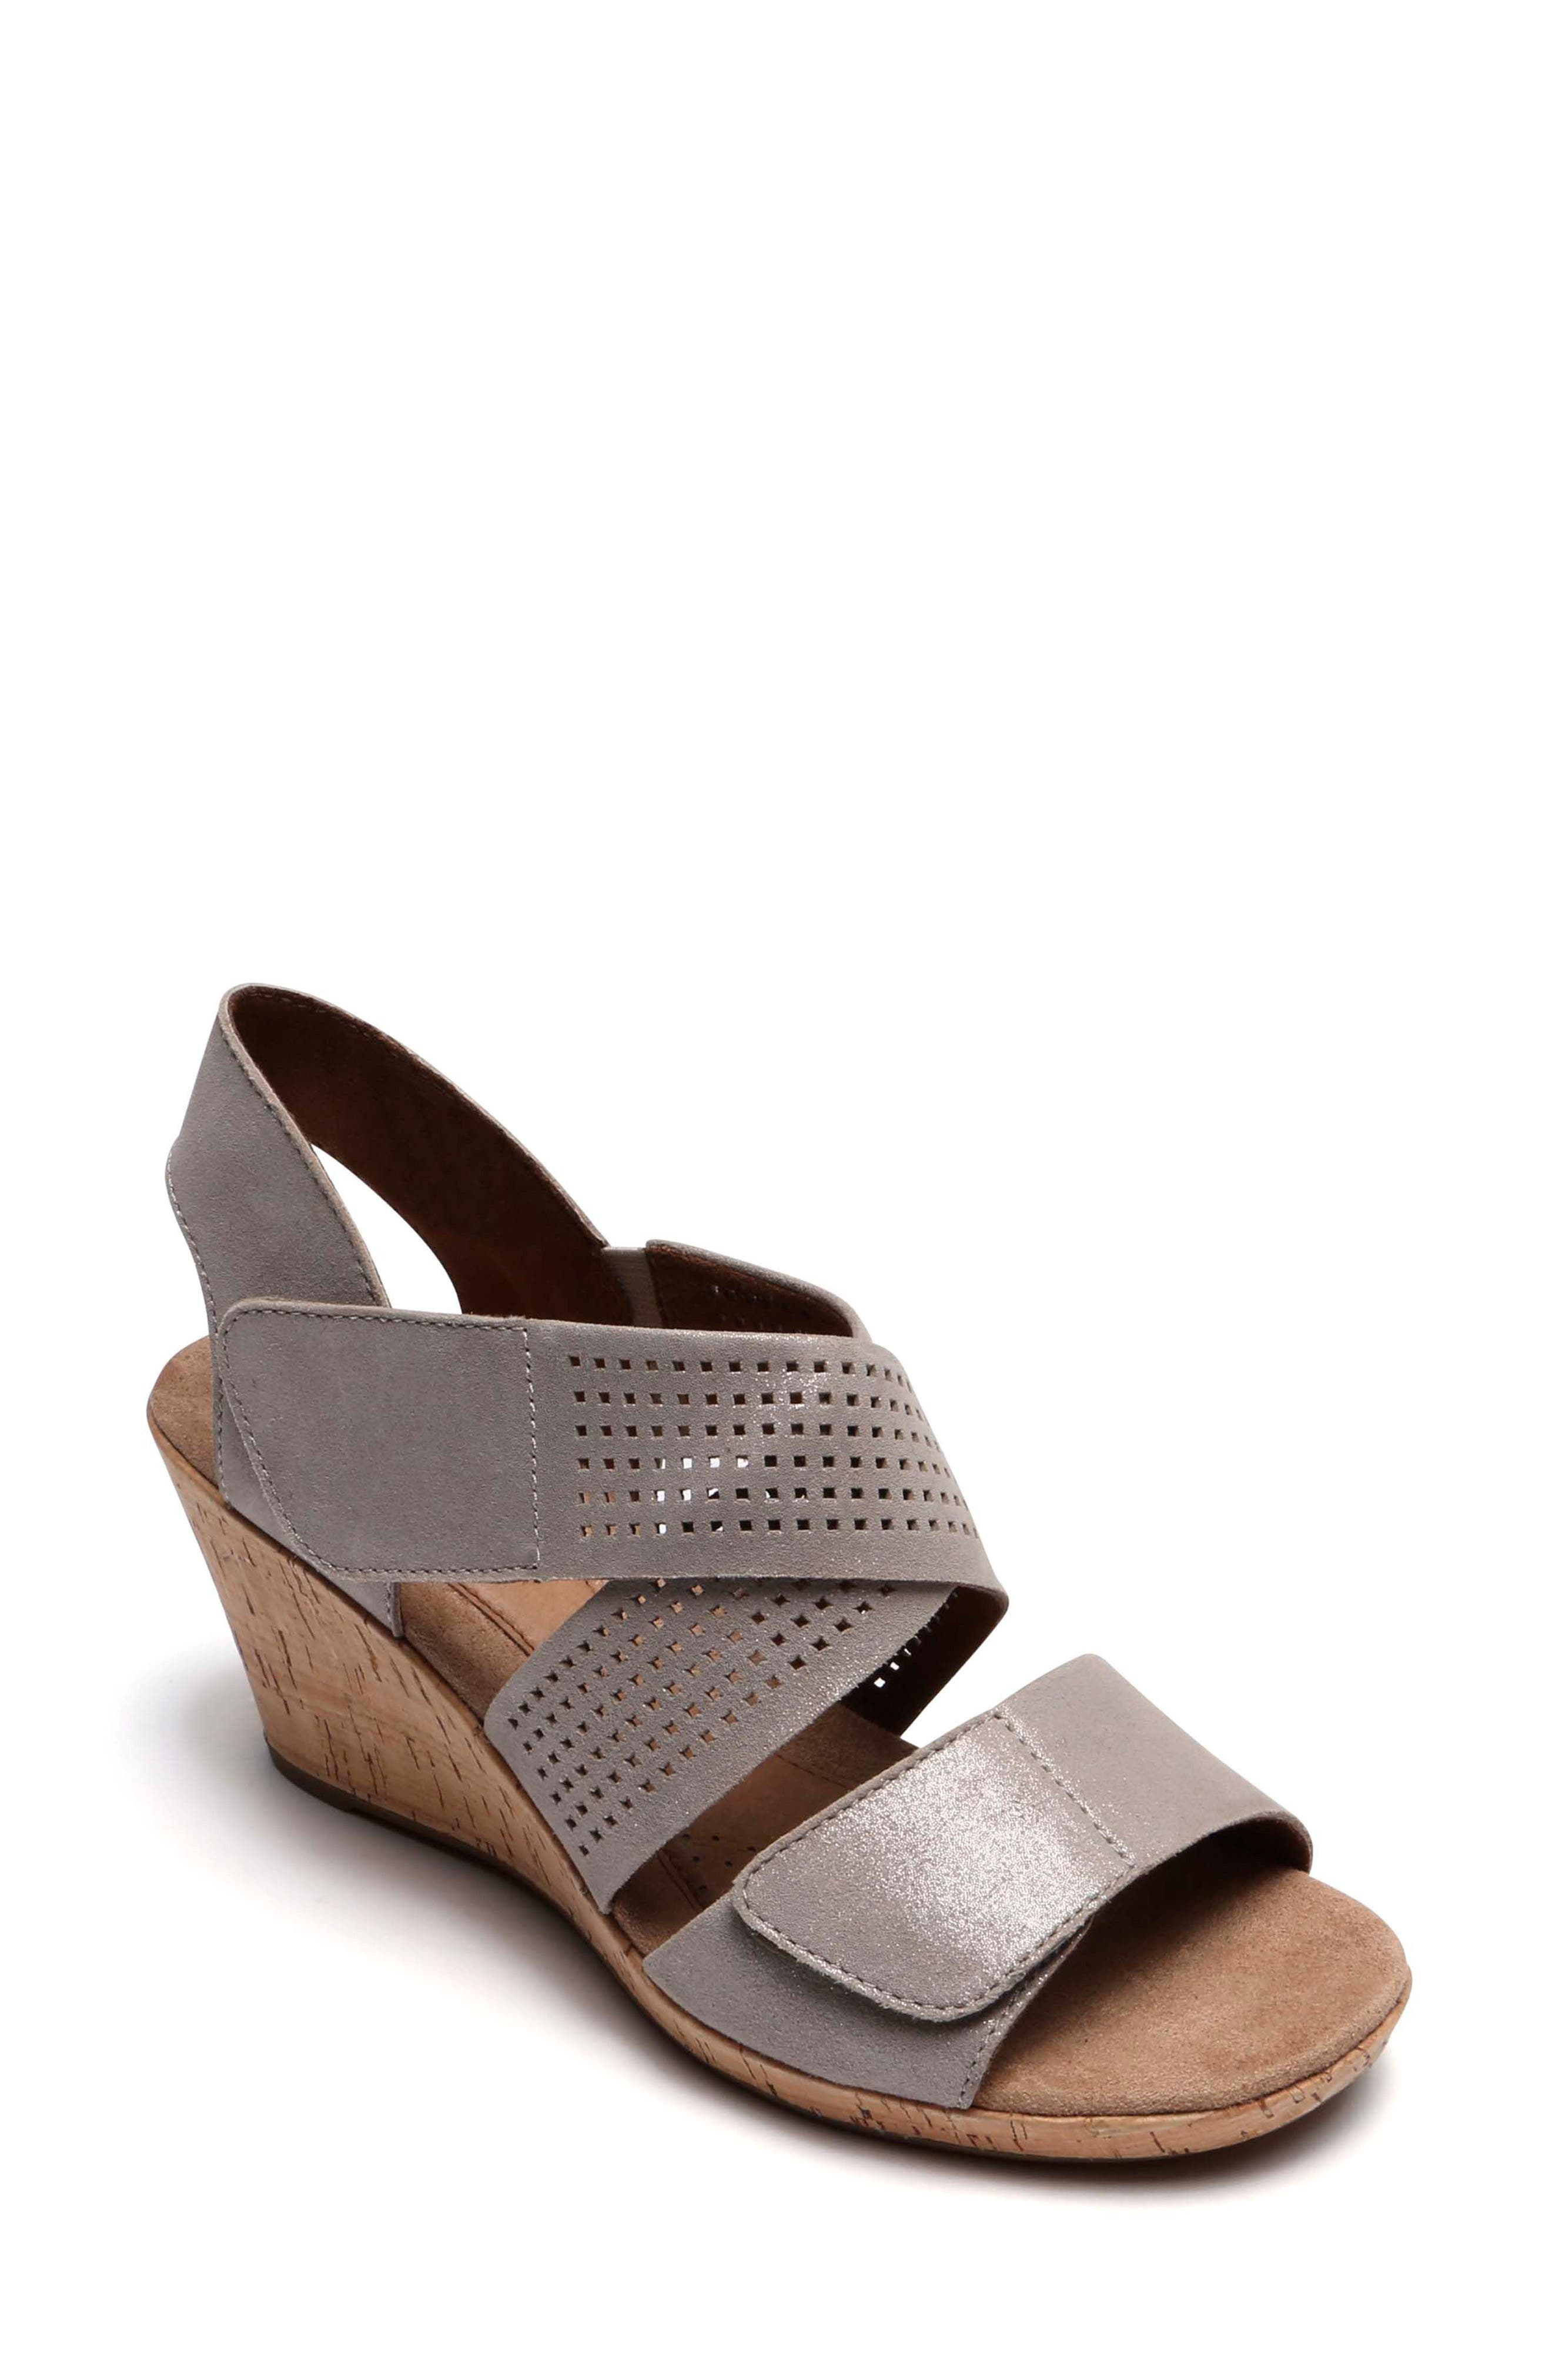 Rockport Cobb Hill Janna Cross Strap Wedge Sandal (Women)